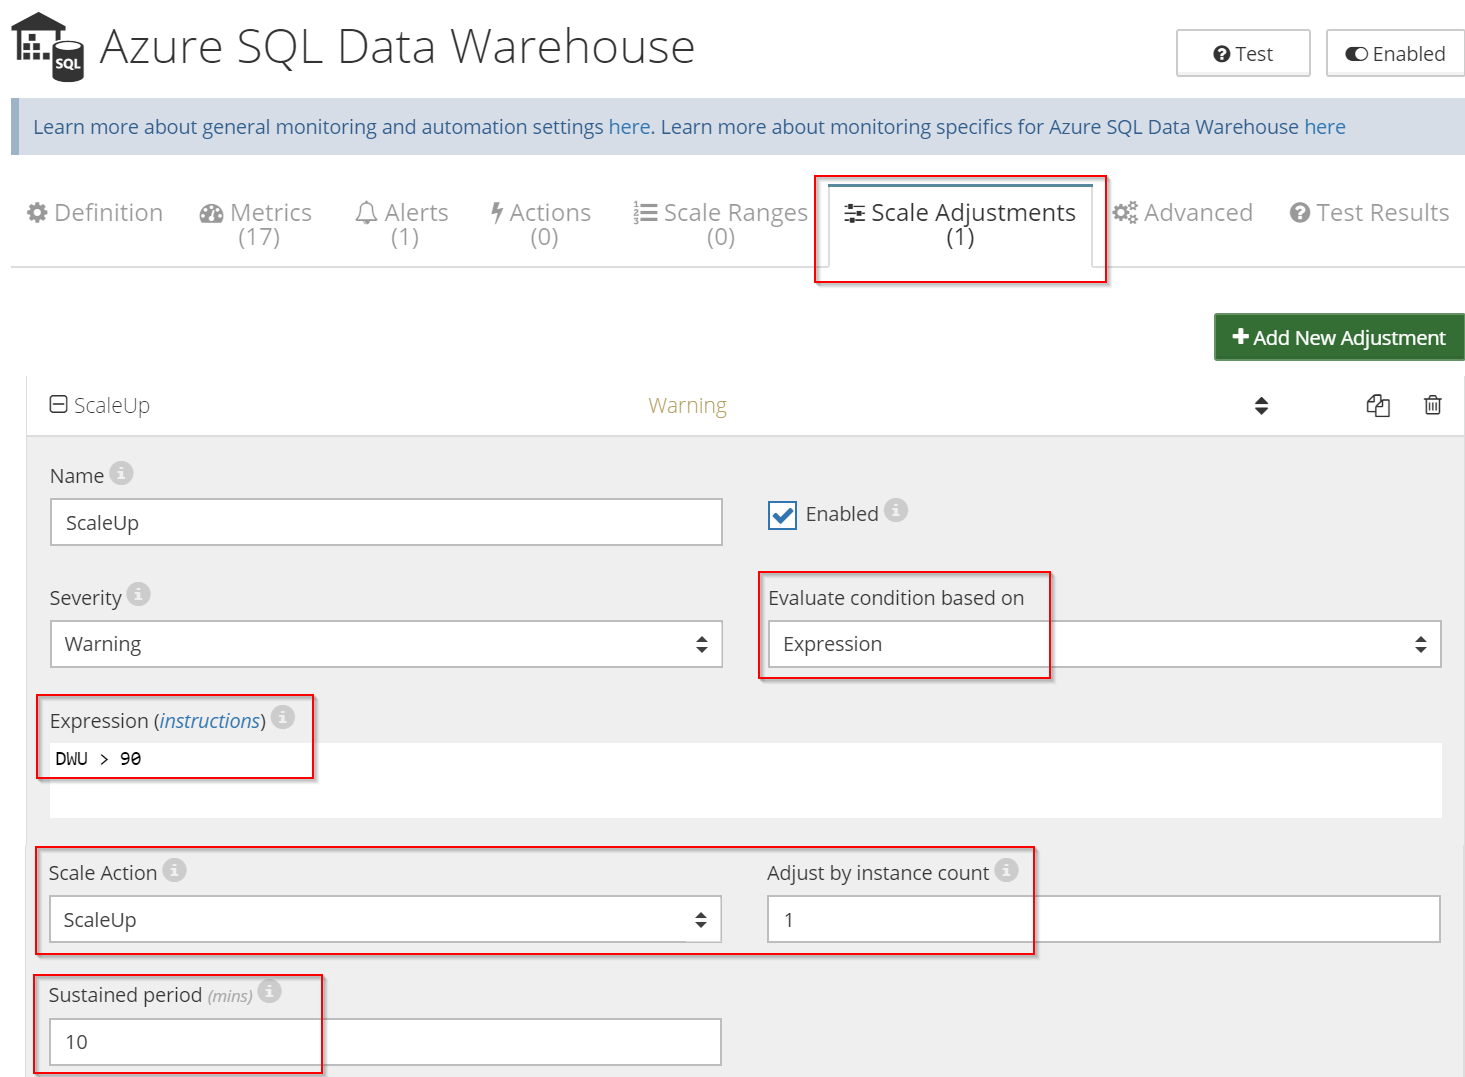 auto-scale Azure SQL Data Warehouse